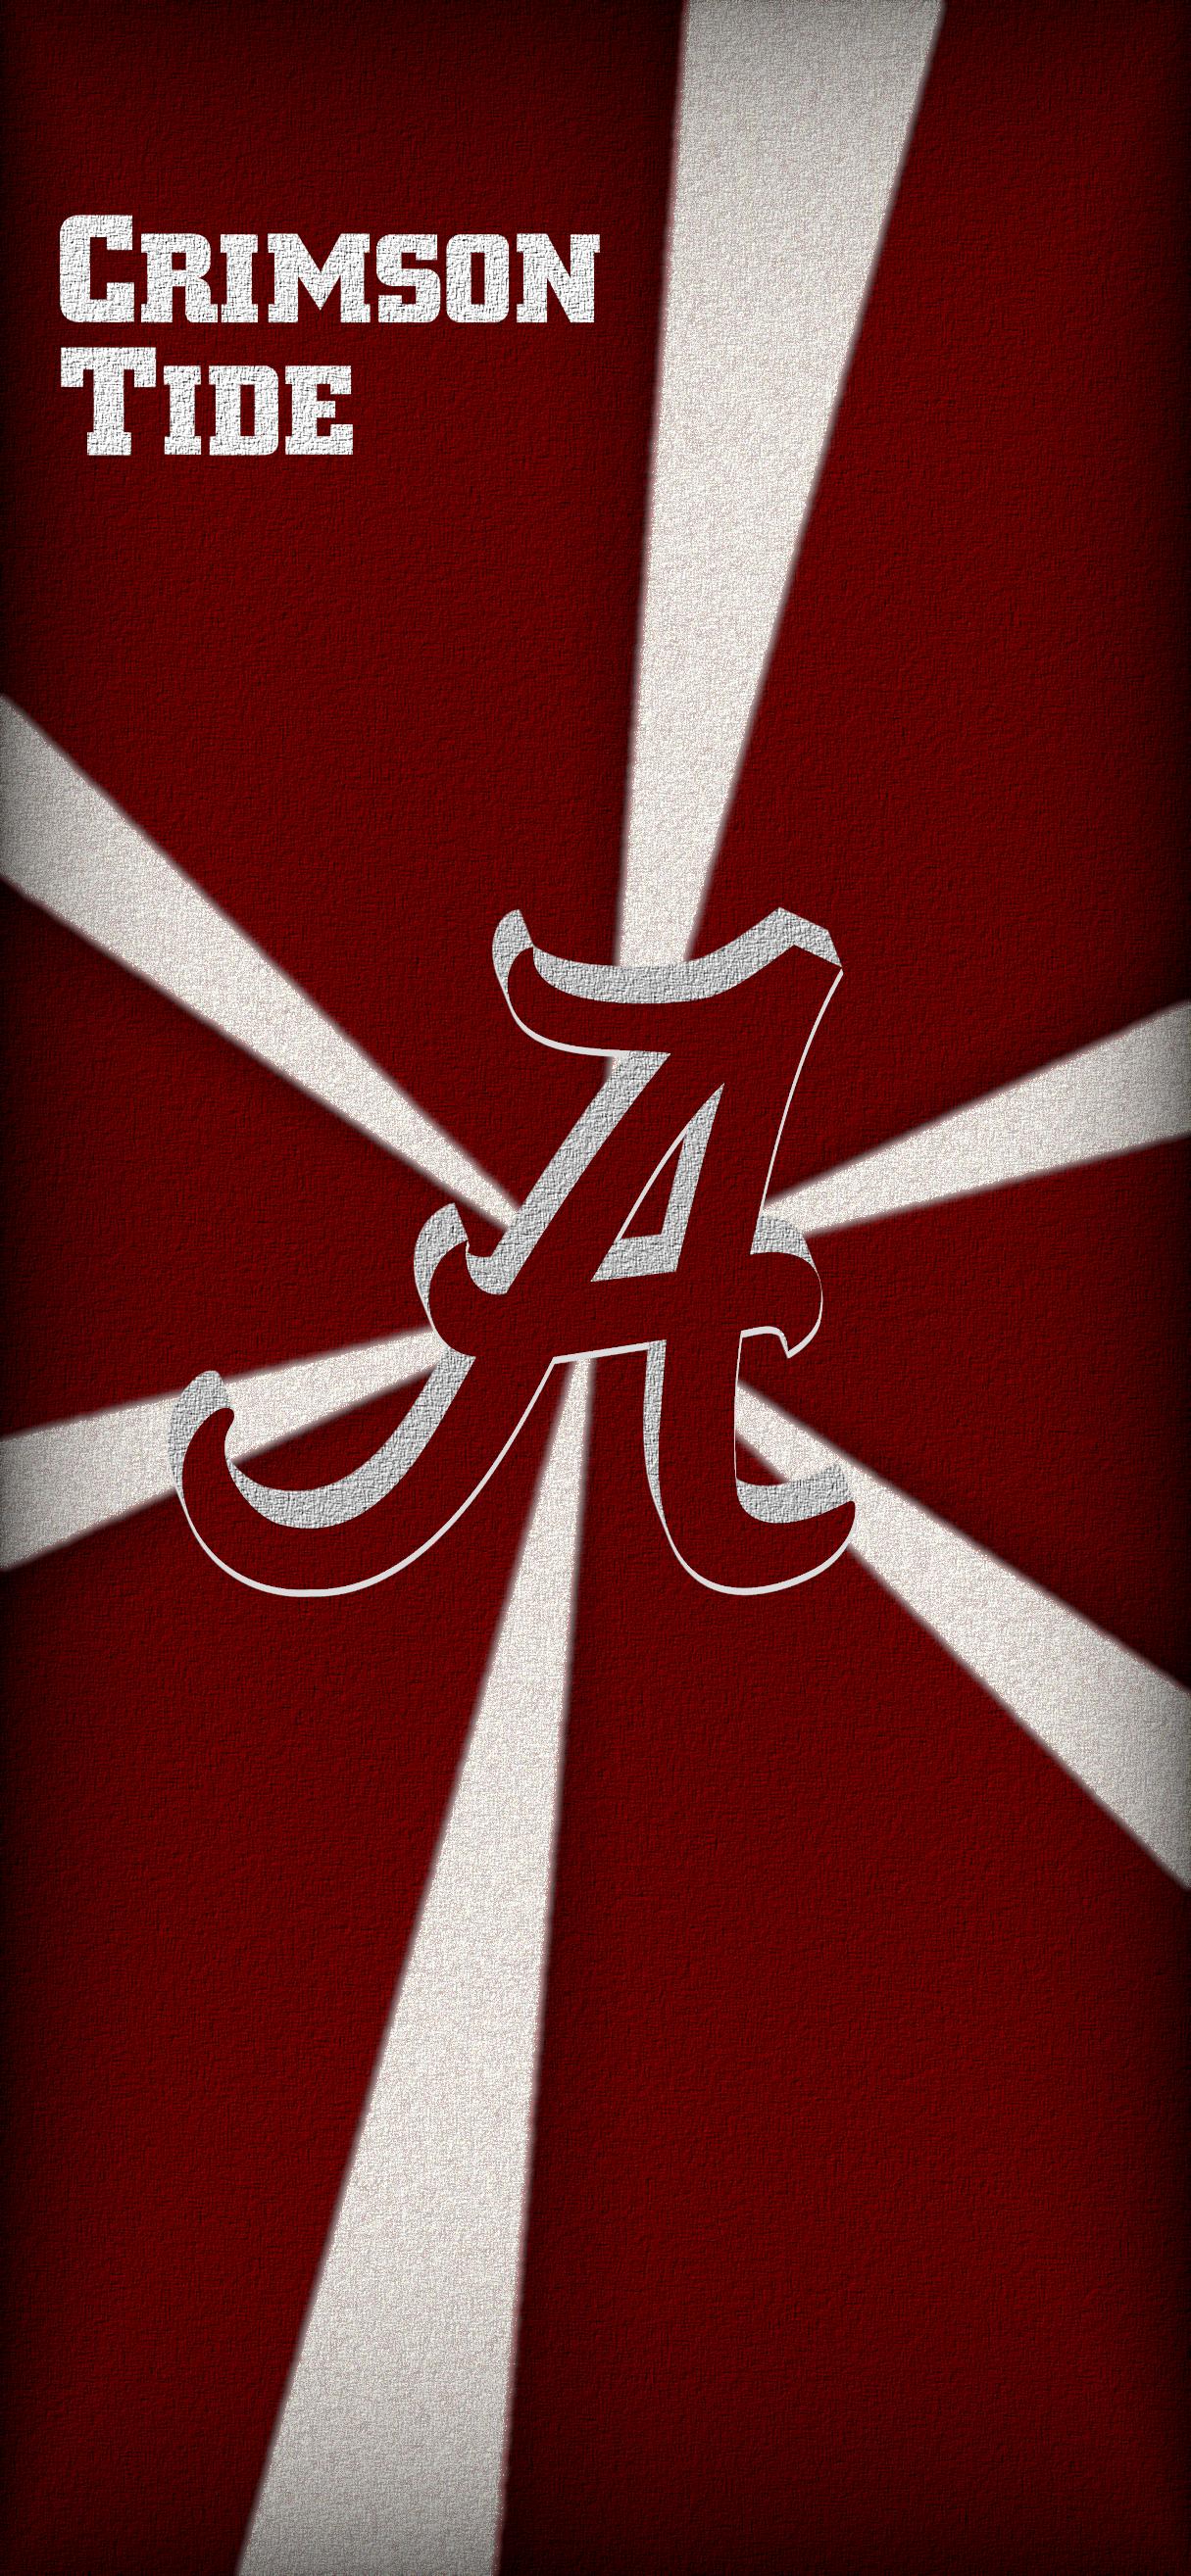 Alabama Crimson Tide Football Logo Iphone Wallpaper In 2020 Alabama Crimson Tide Football Wallpaper Alabama Crimson Tide Logo Alabama Crimson Tide